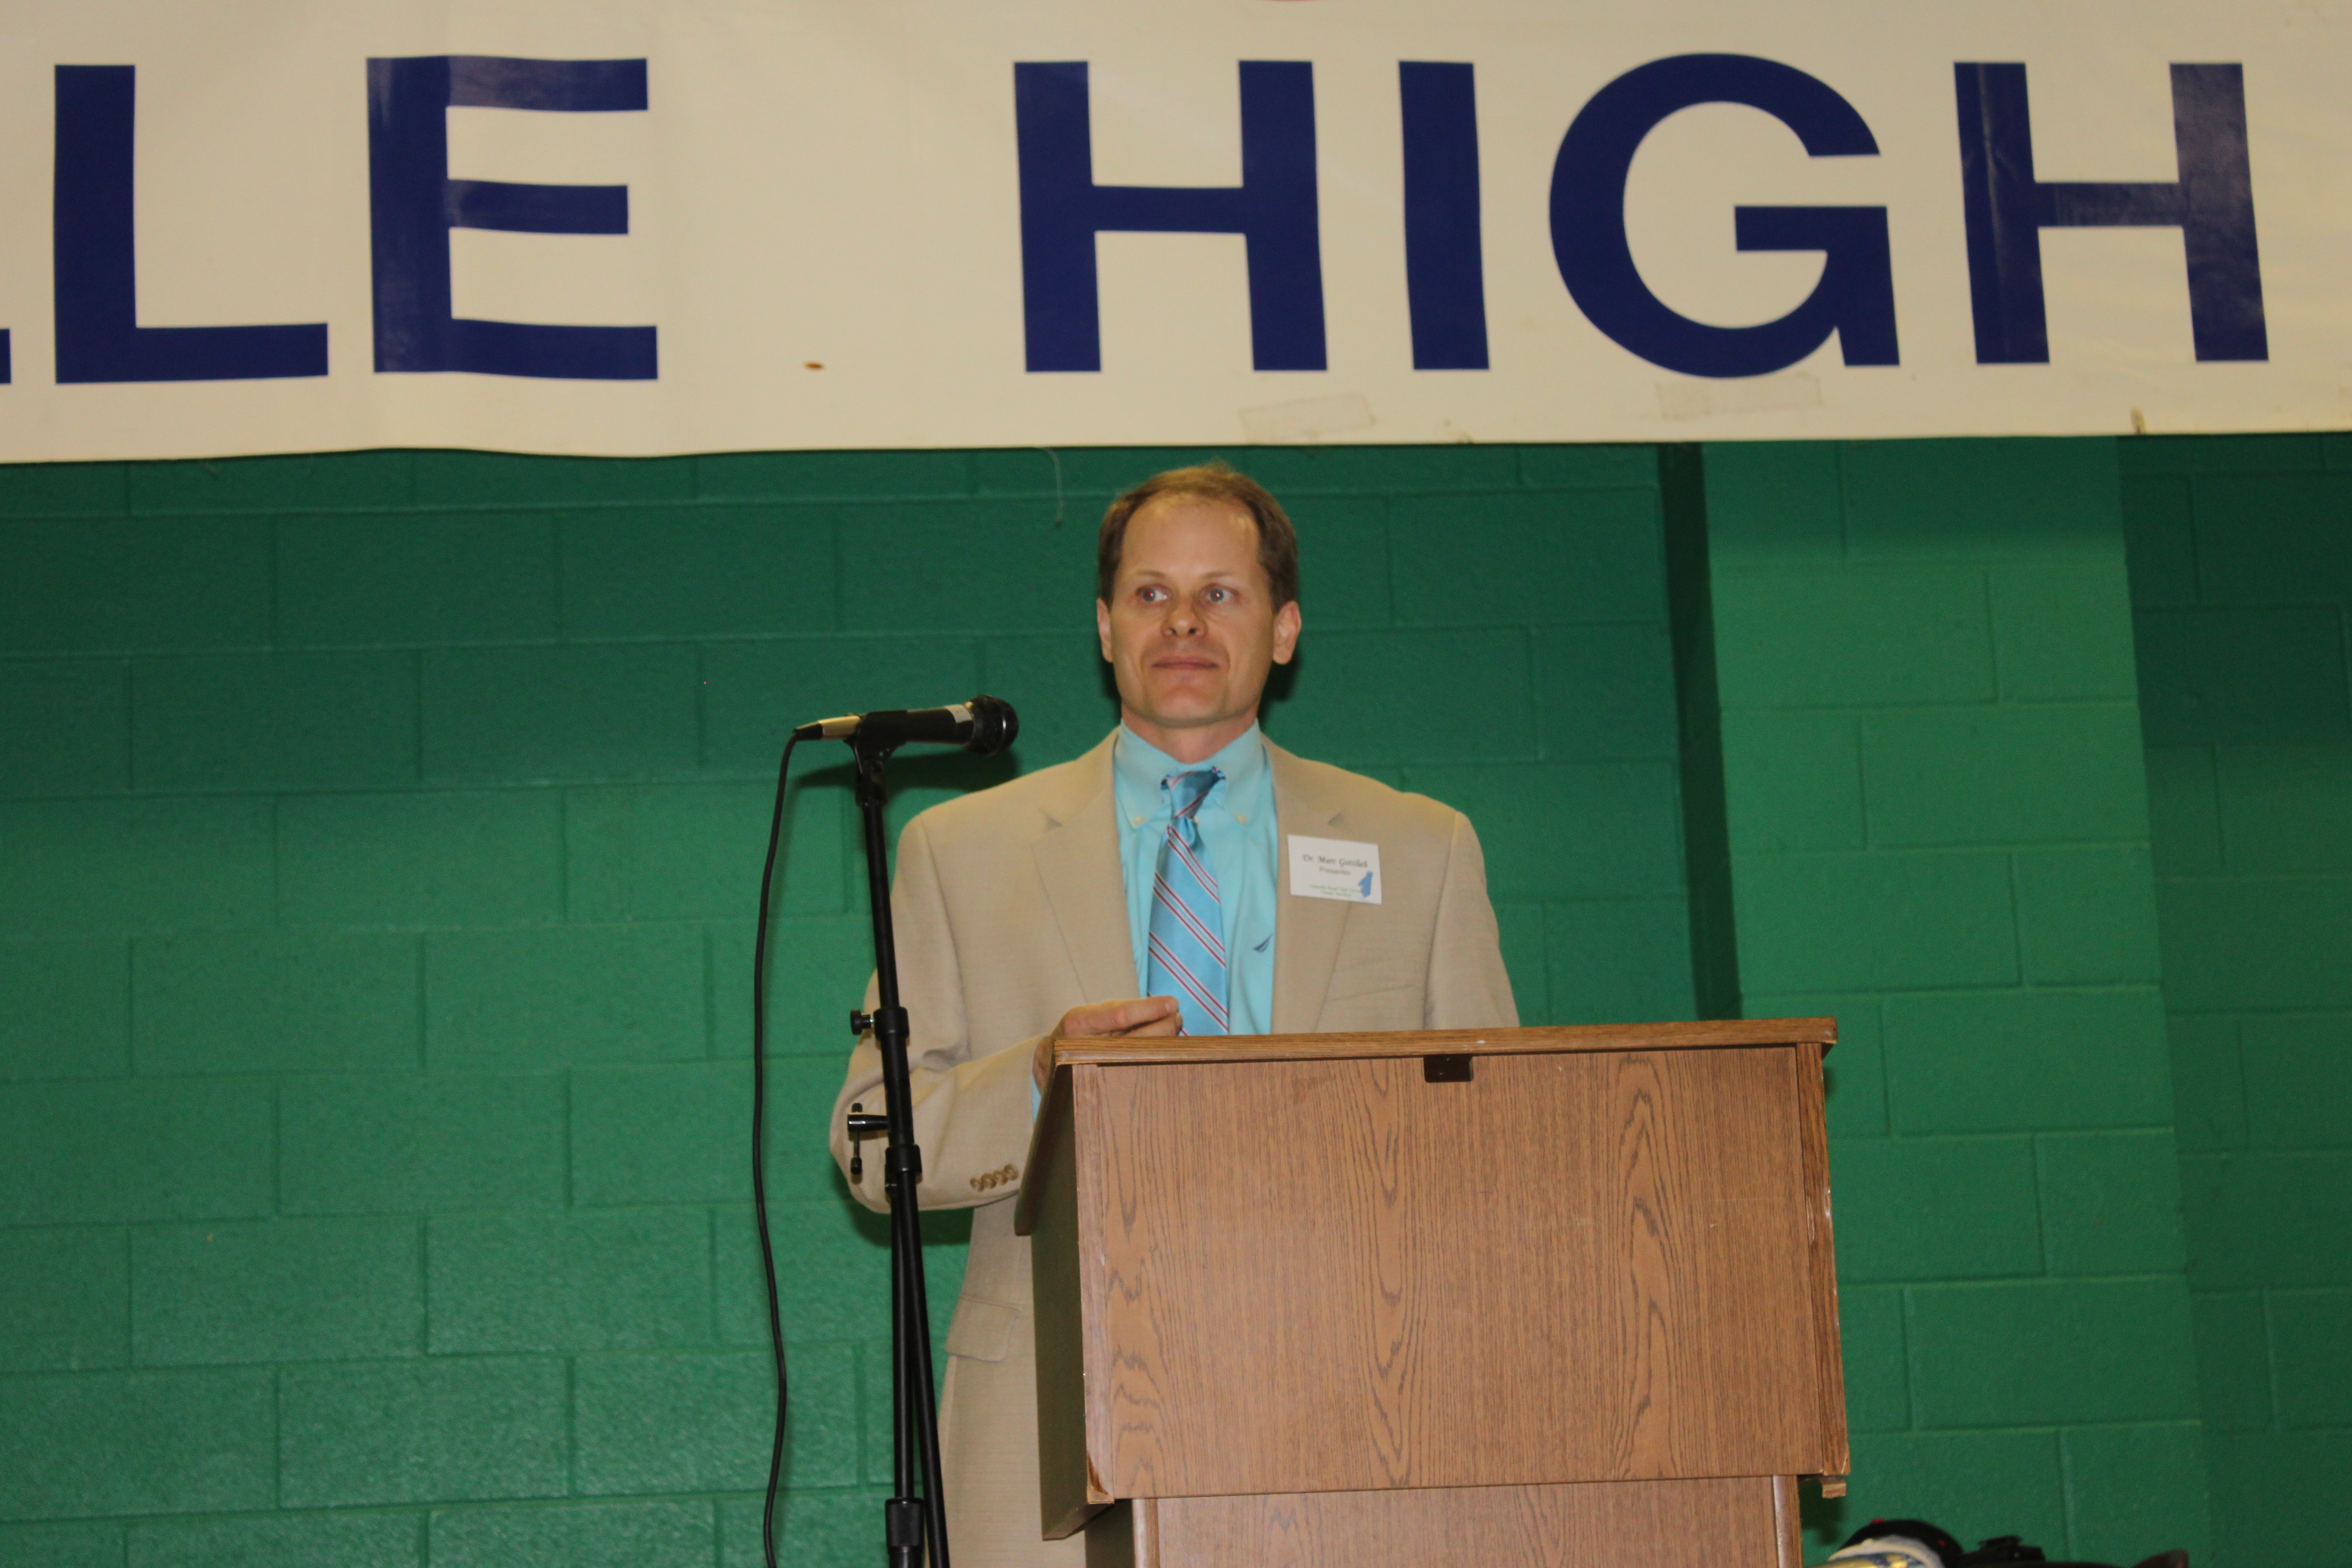 Dr. Gottlieb speaks at the career fair. Photo courtesy of Alex Schuler.